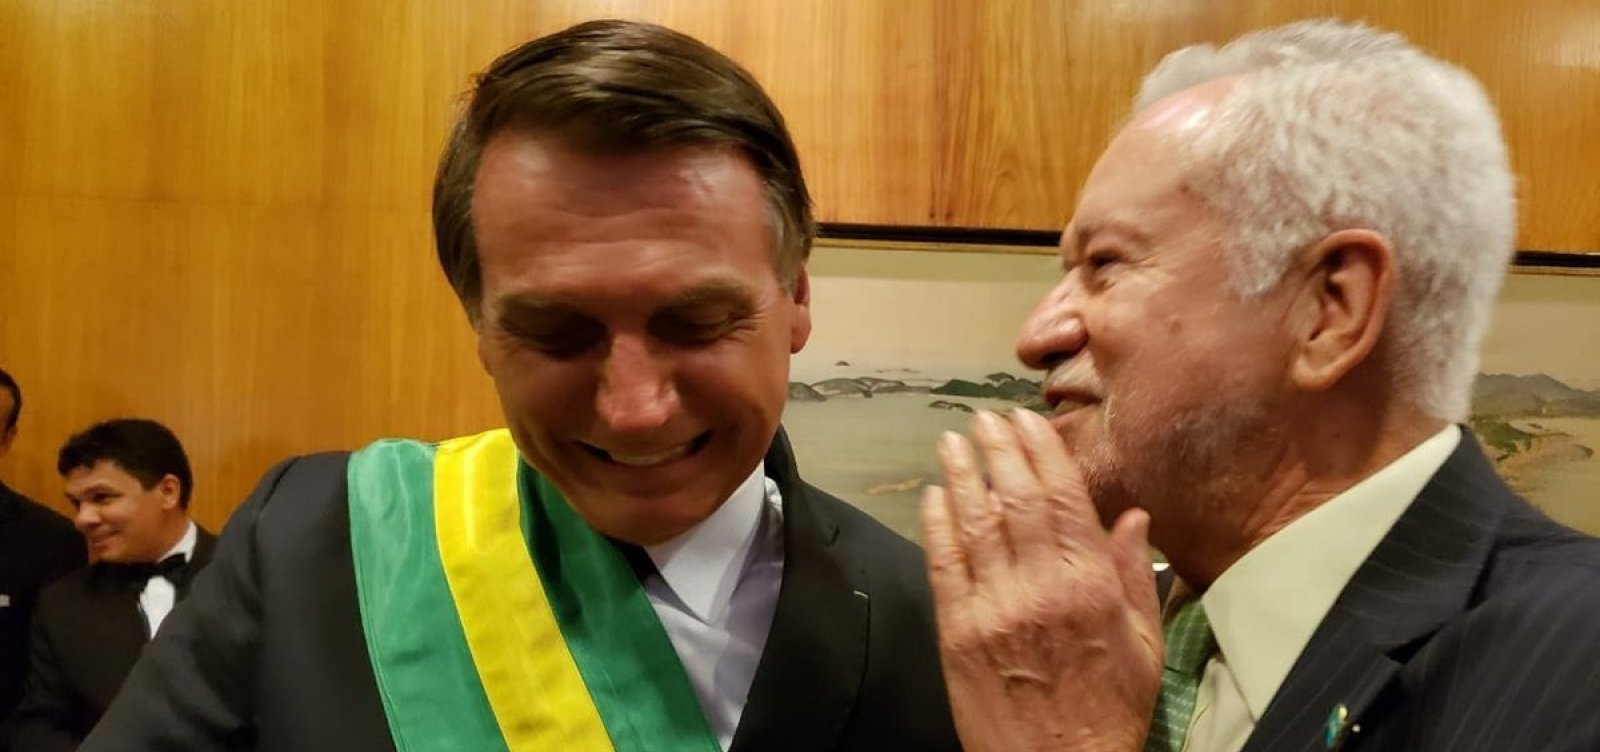 [Alexandre Garcia é cotado para assumir cargo de porta-voz de Bolsonaro]